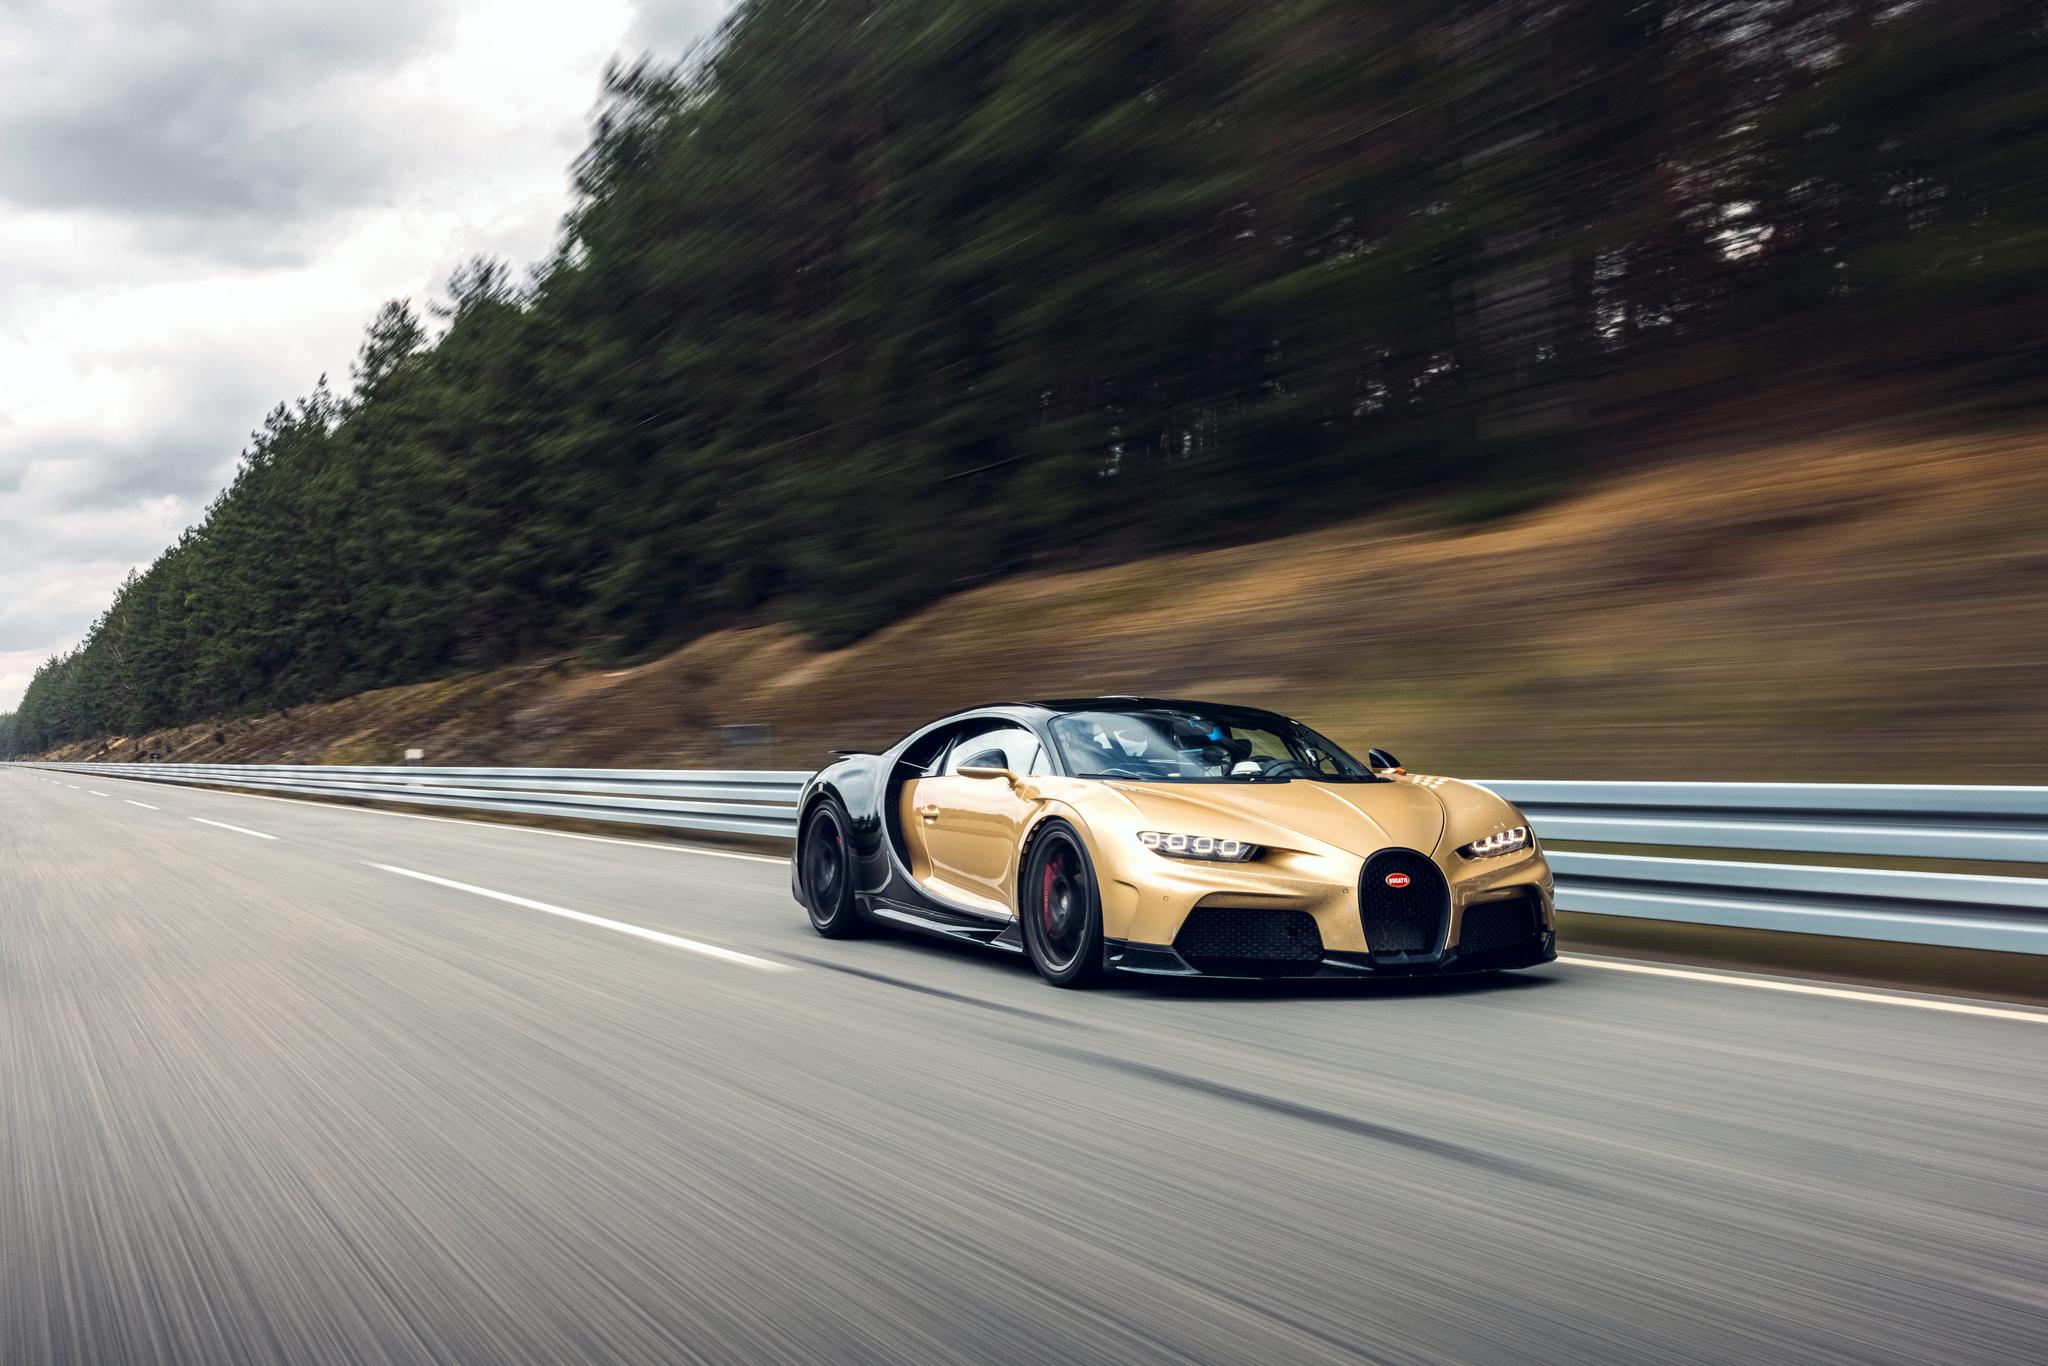 Gold Bugatti Chiron Super Sport